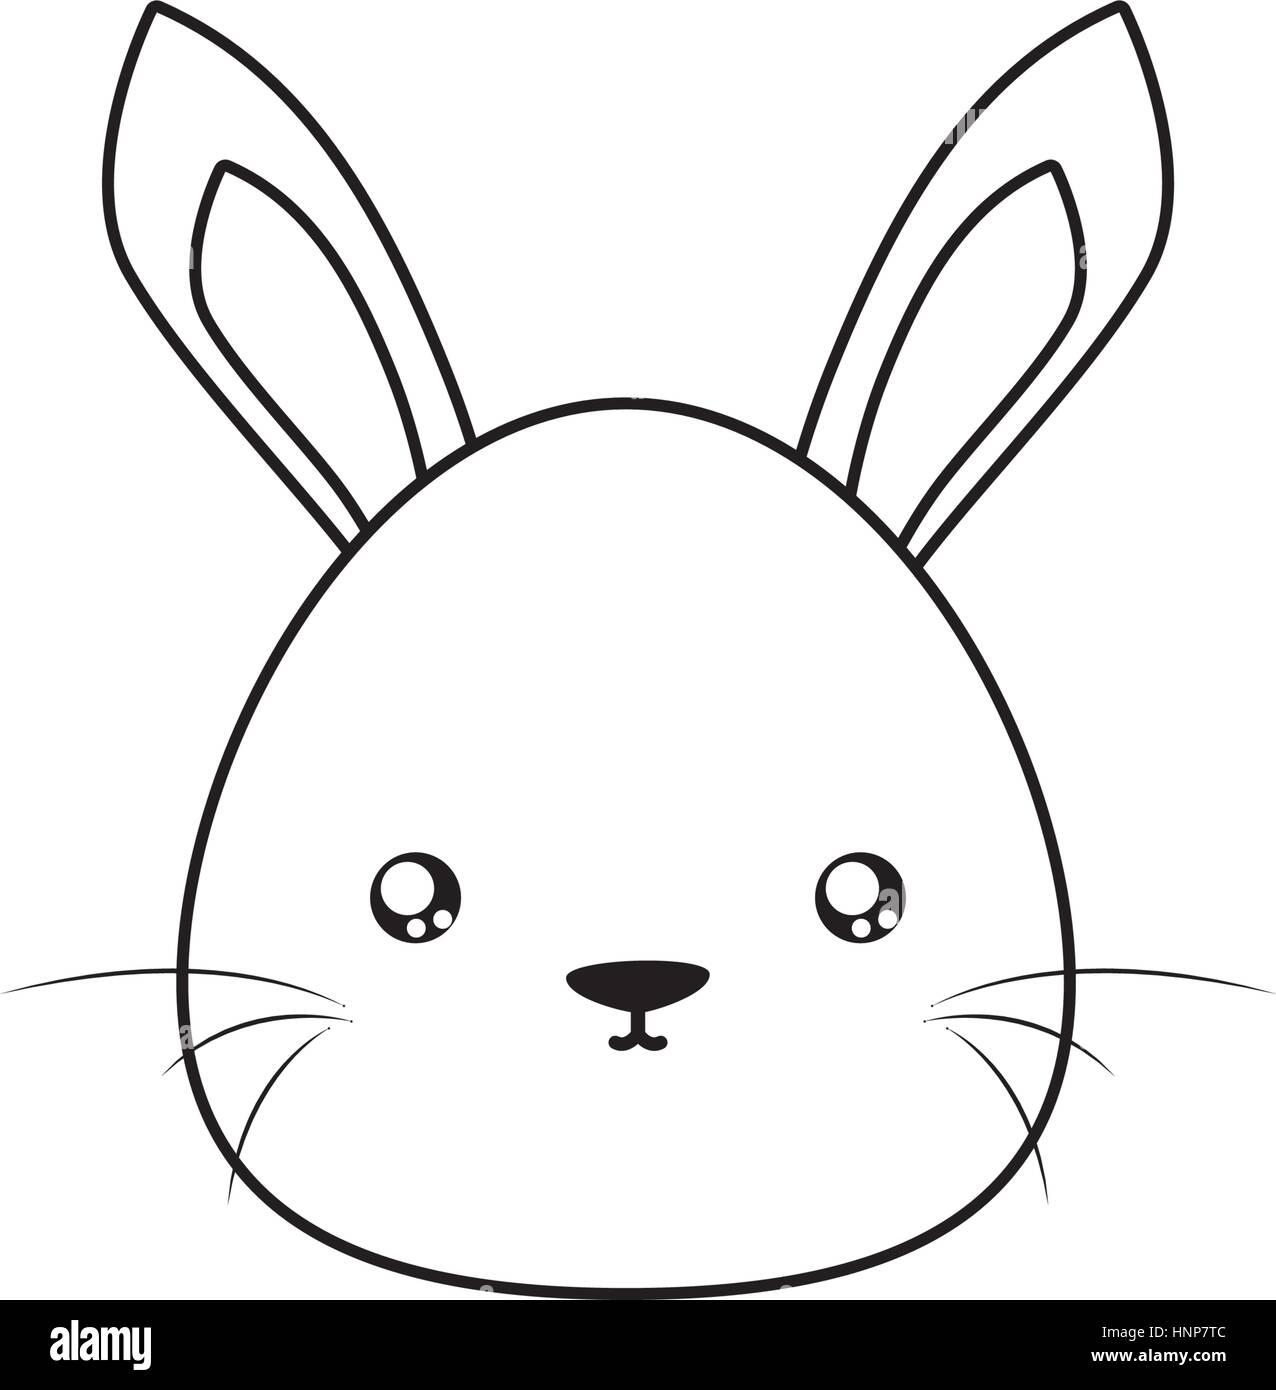 rabbit Drawing Face - Stock Vector